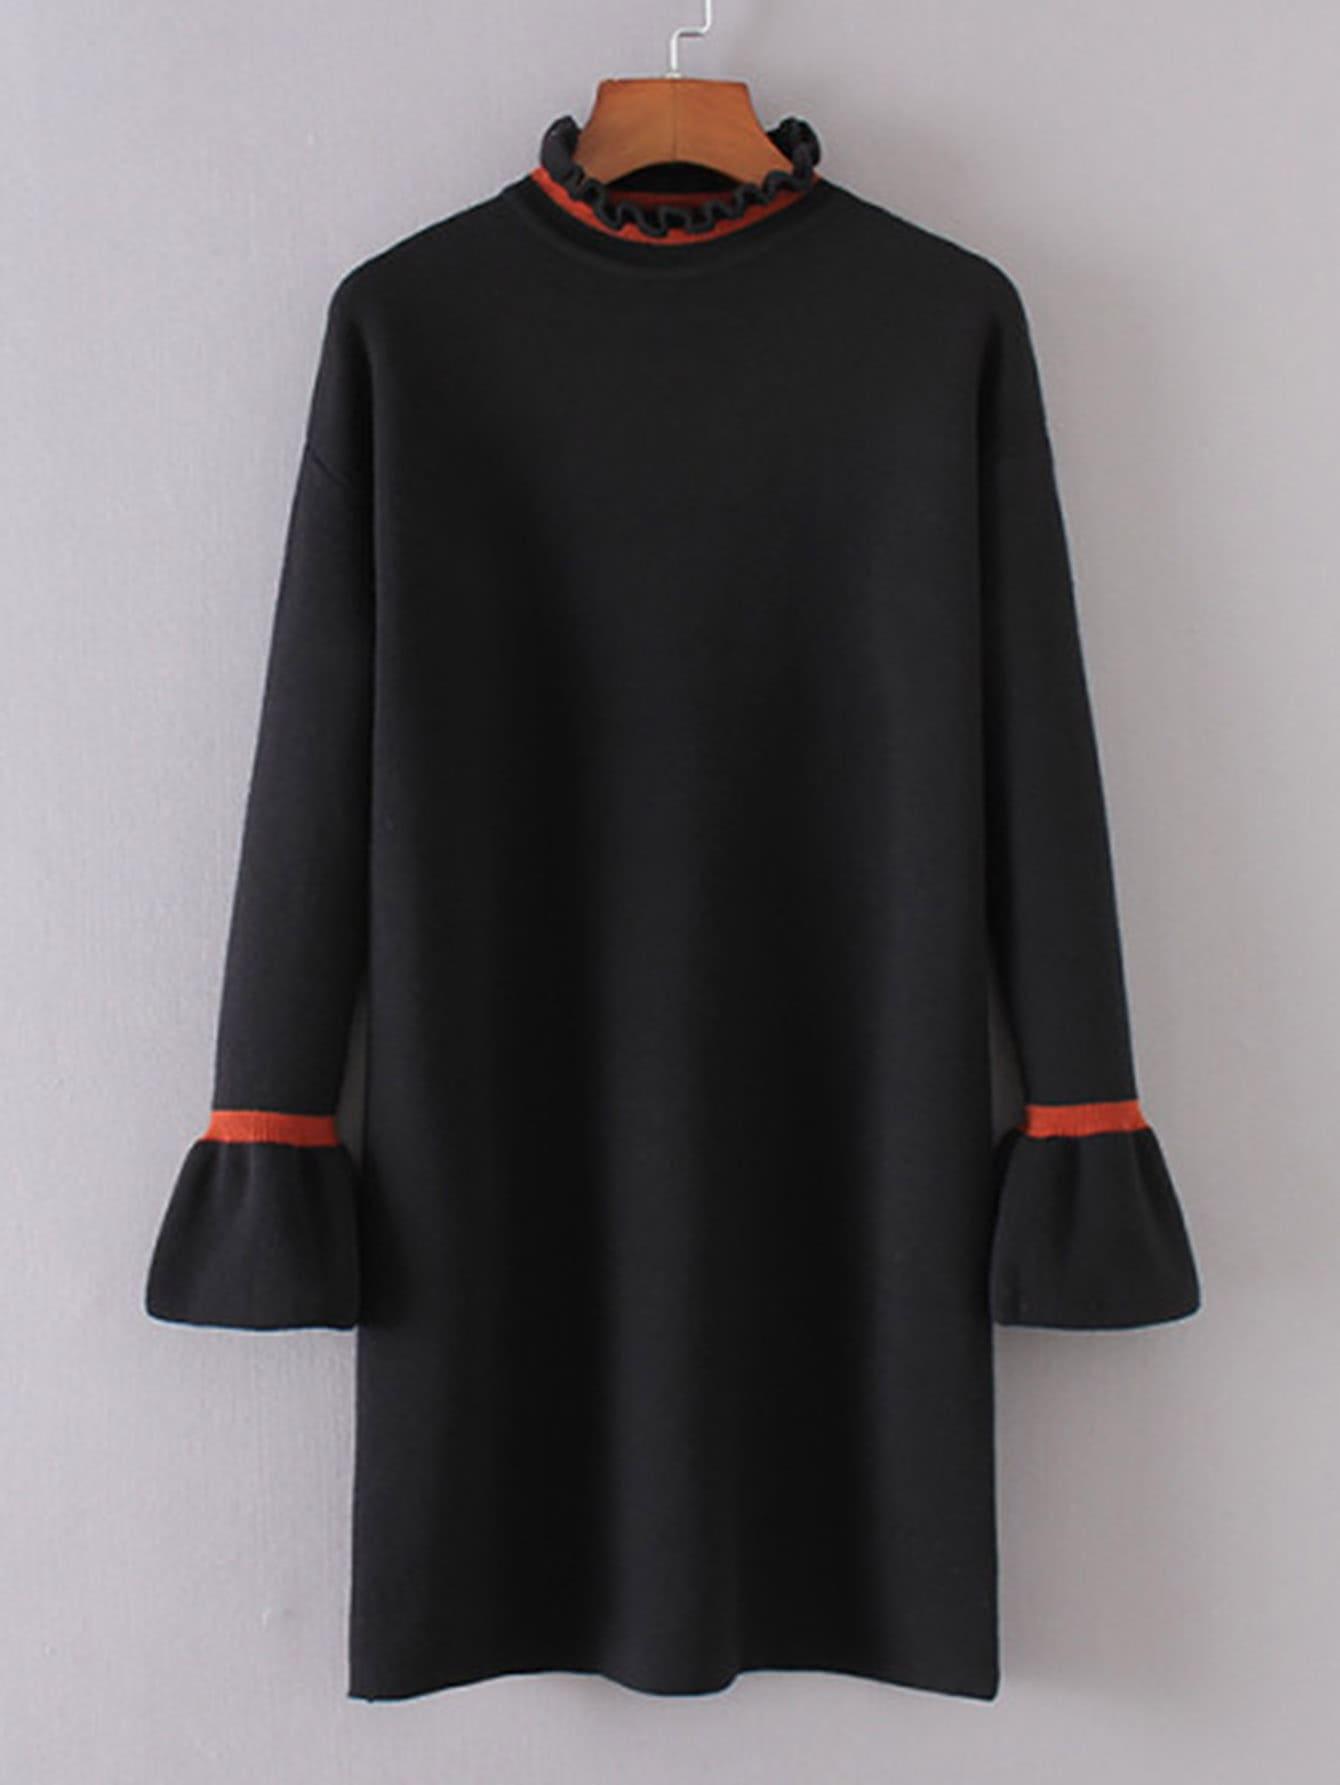 Contrast Trim Frill Neck Sweater Dress